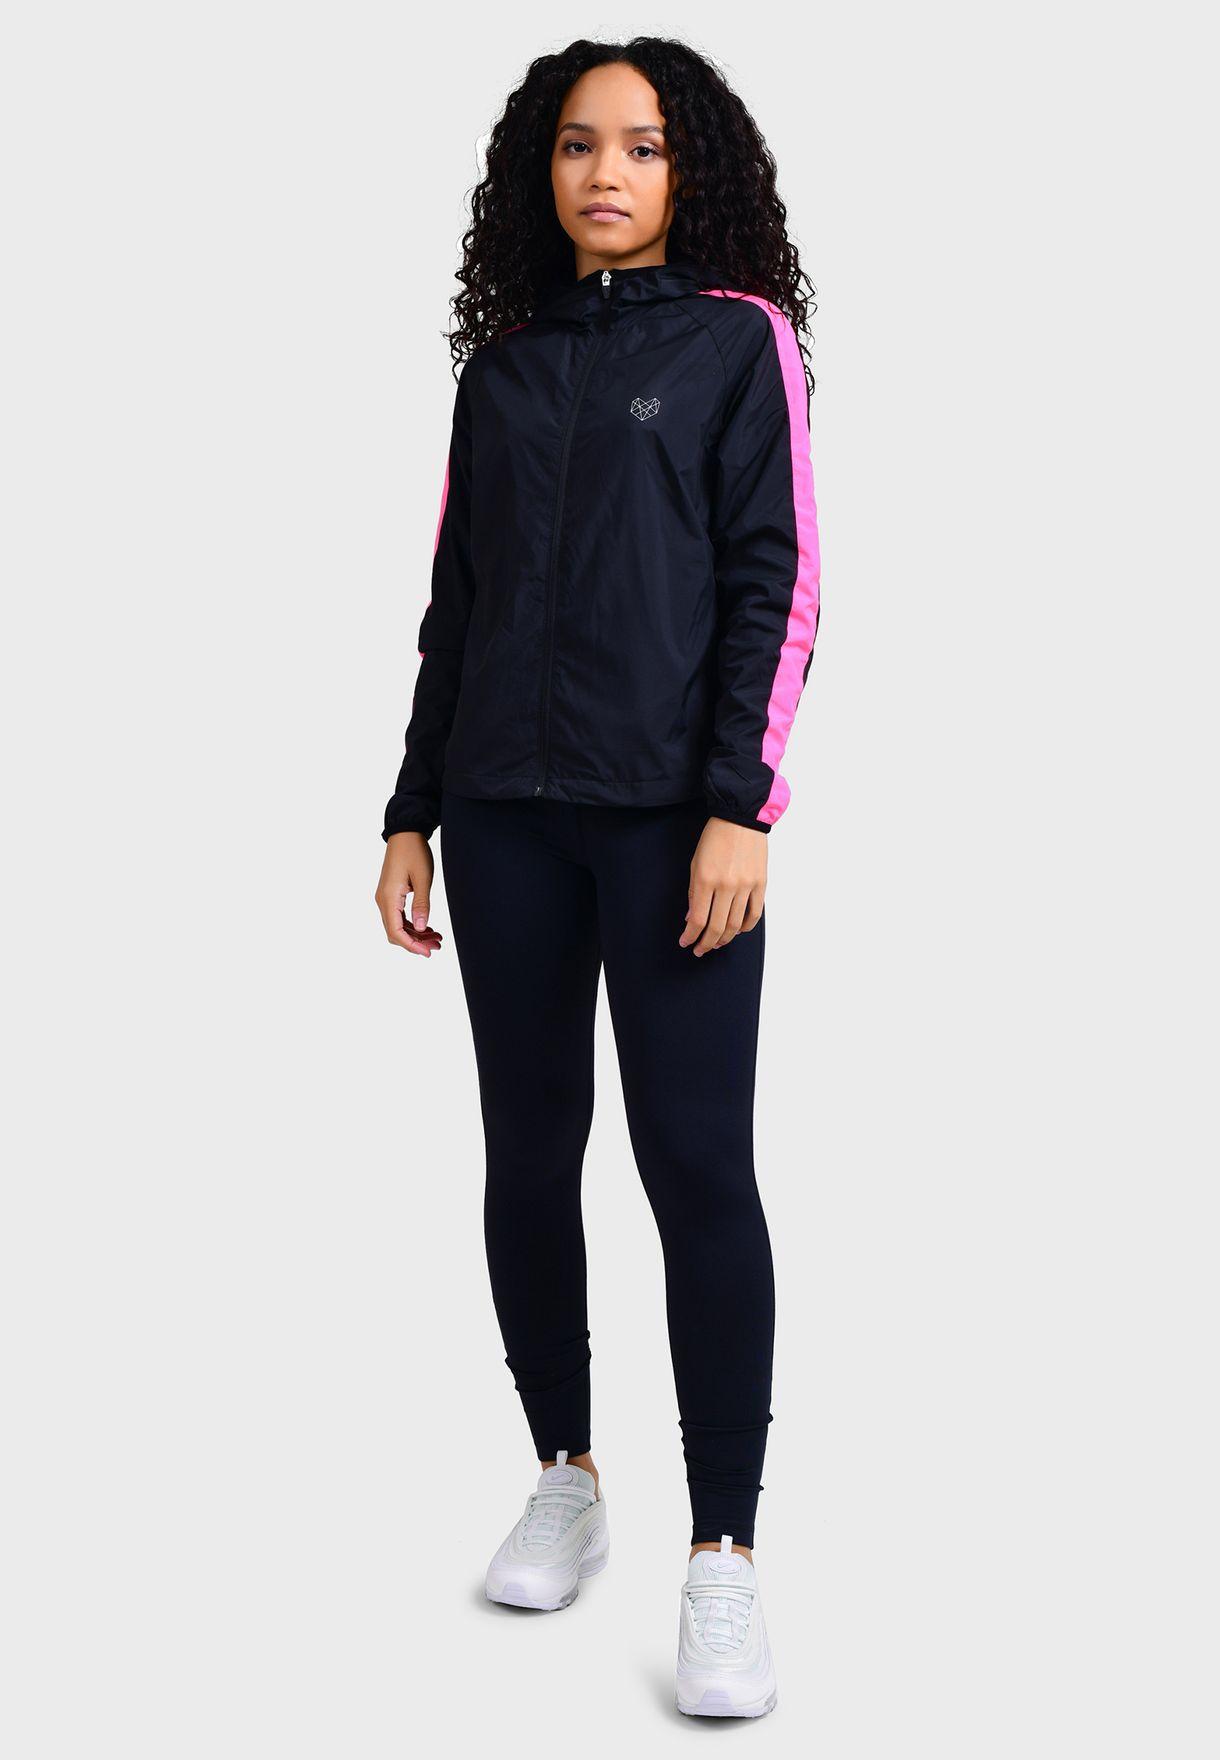 Topaz Windcheater Jacket